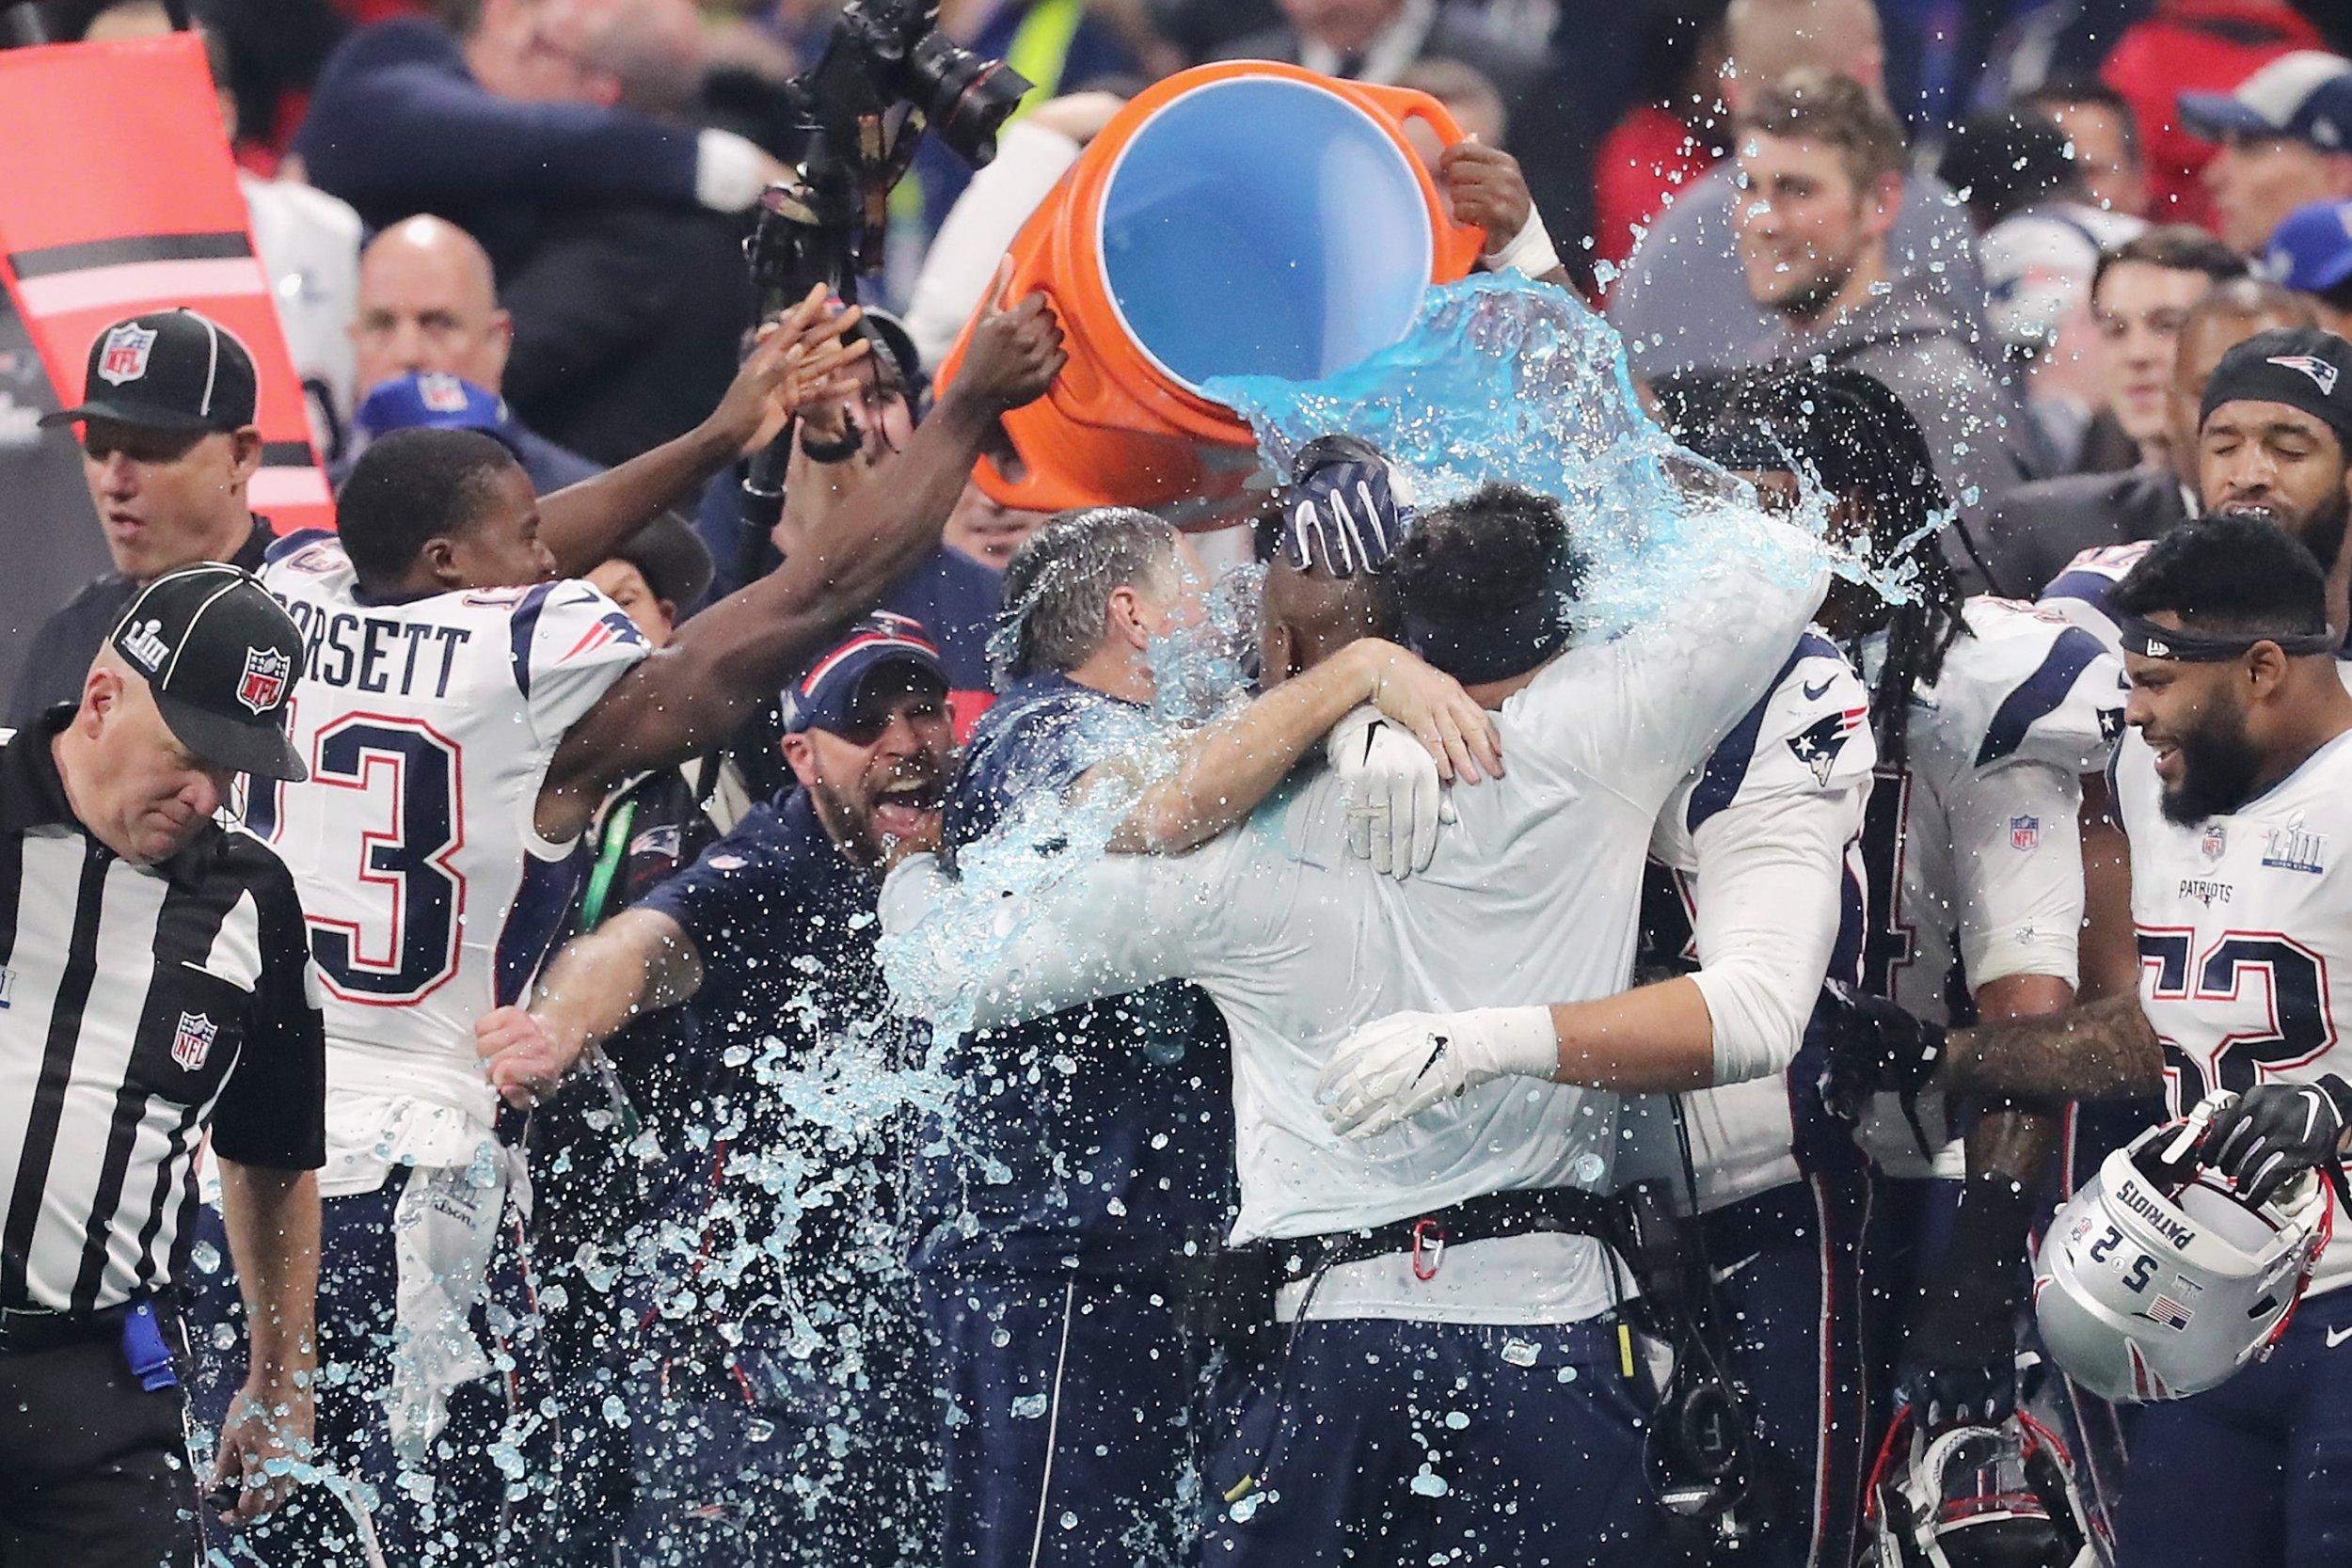 patriots gatorade shower win